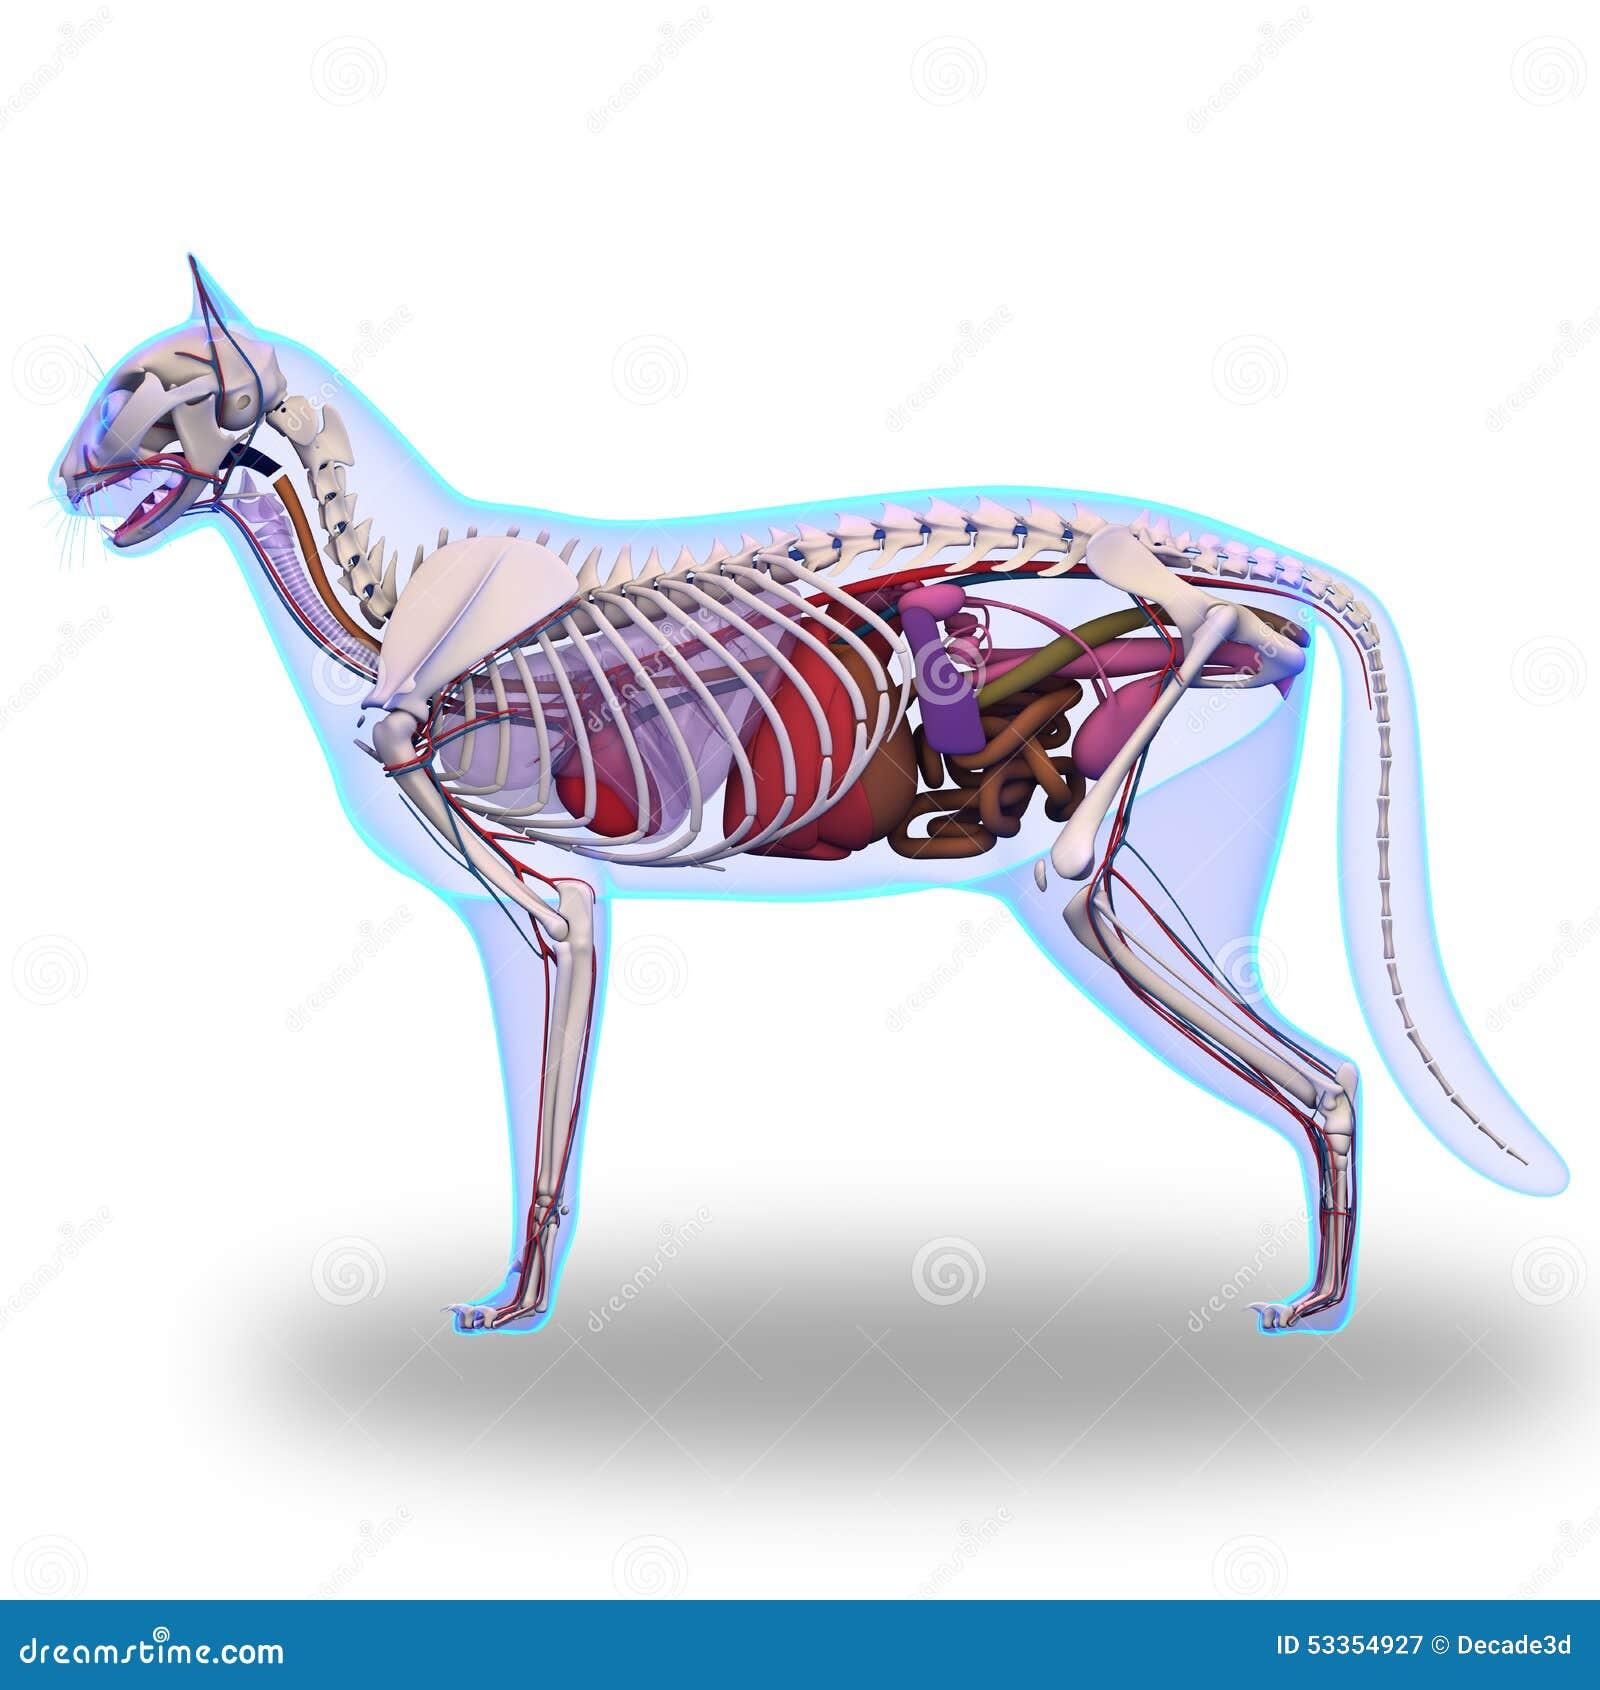 Cat Anatomy - Internal Anatomy Of A Cat Stock Image - Image of ...